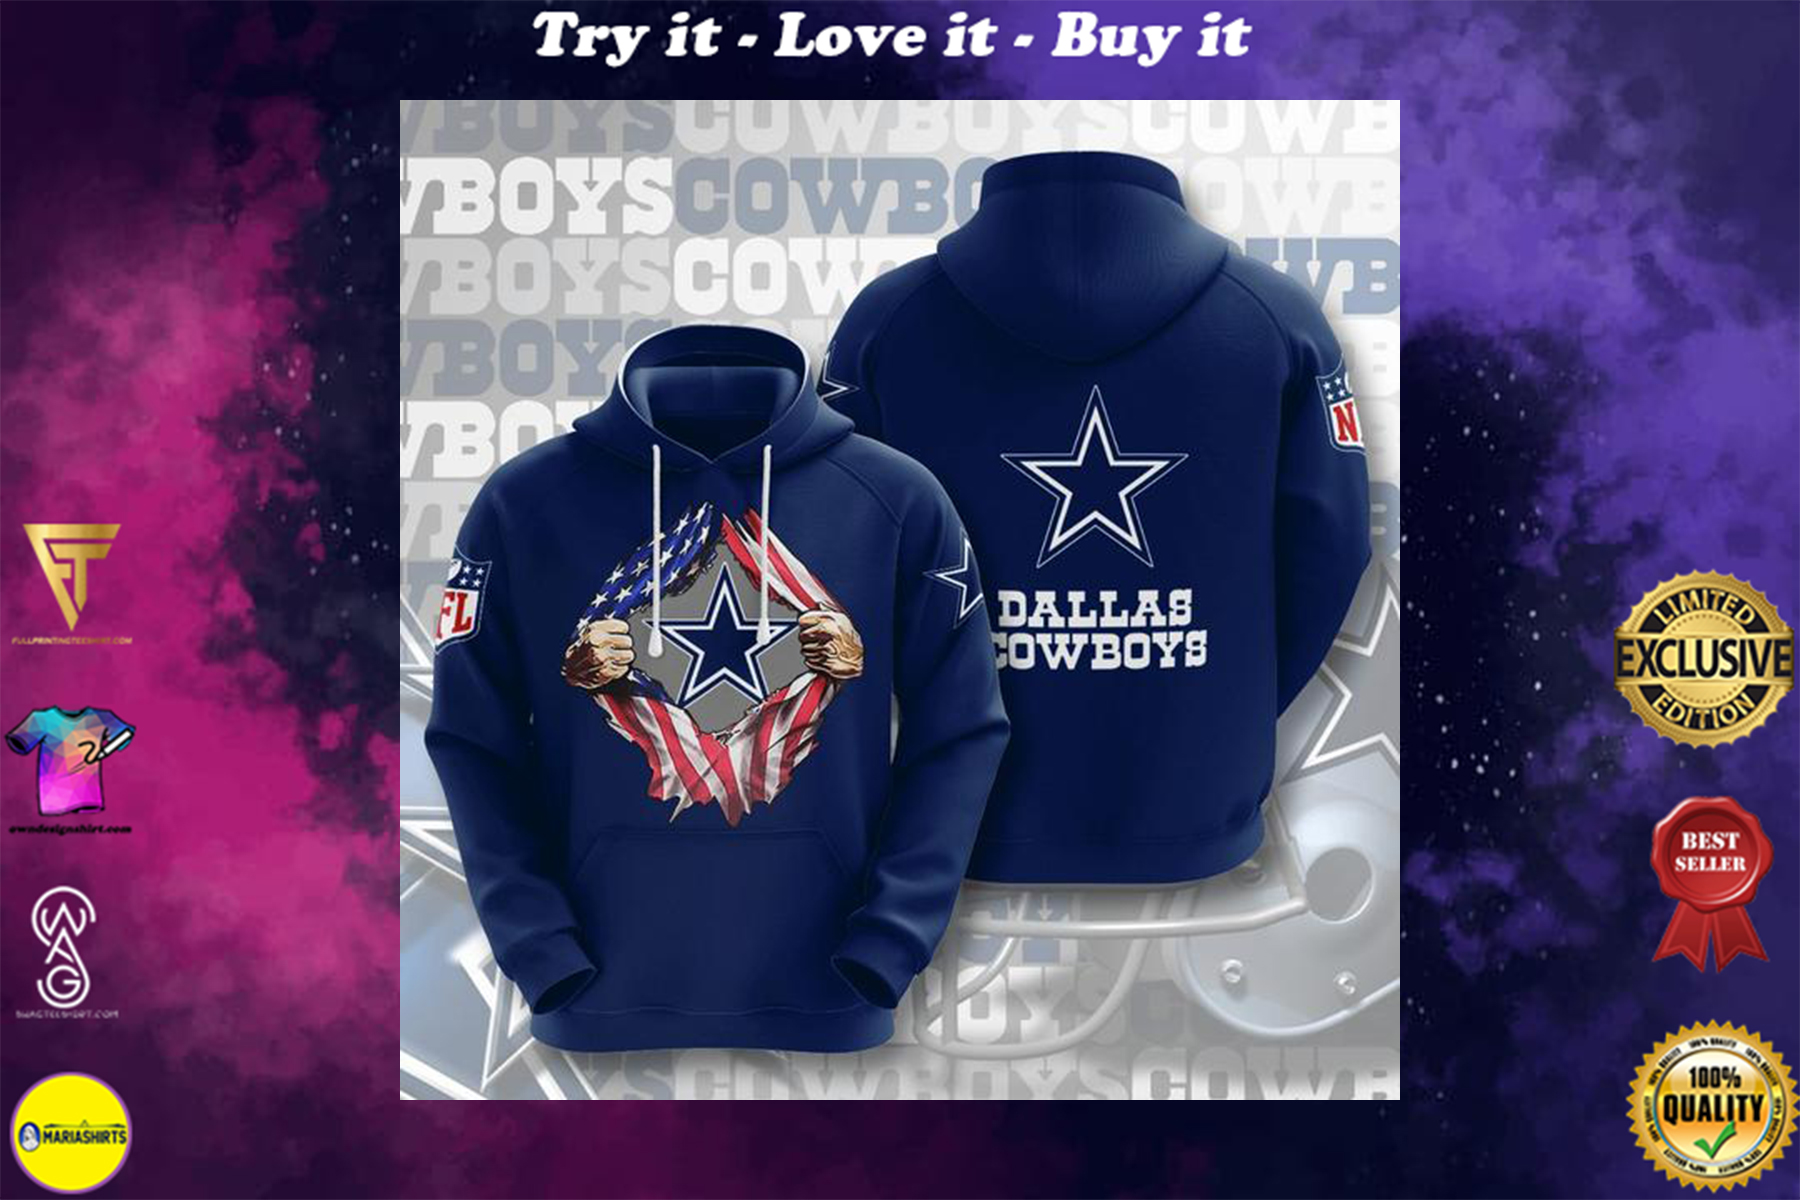 [special edition] american flag dallas cowboys full printing shirt - maria